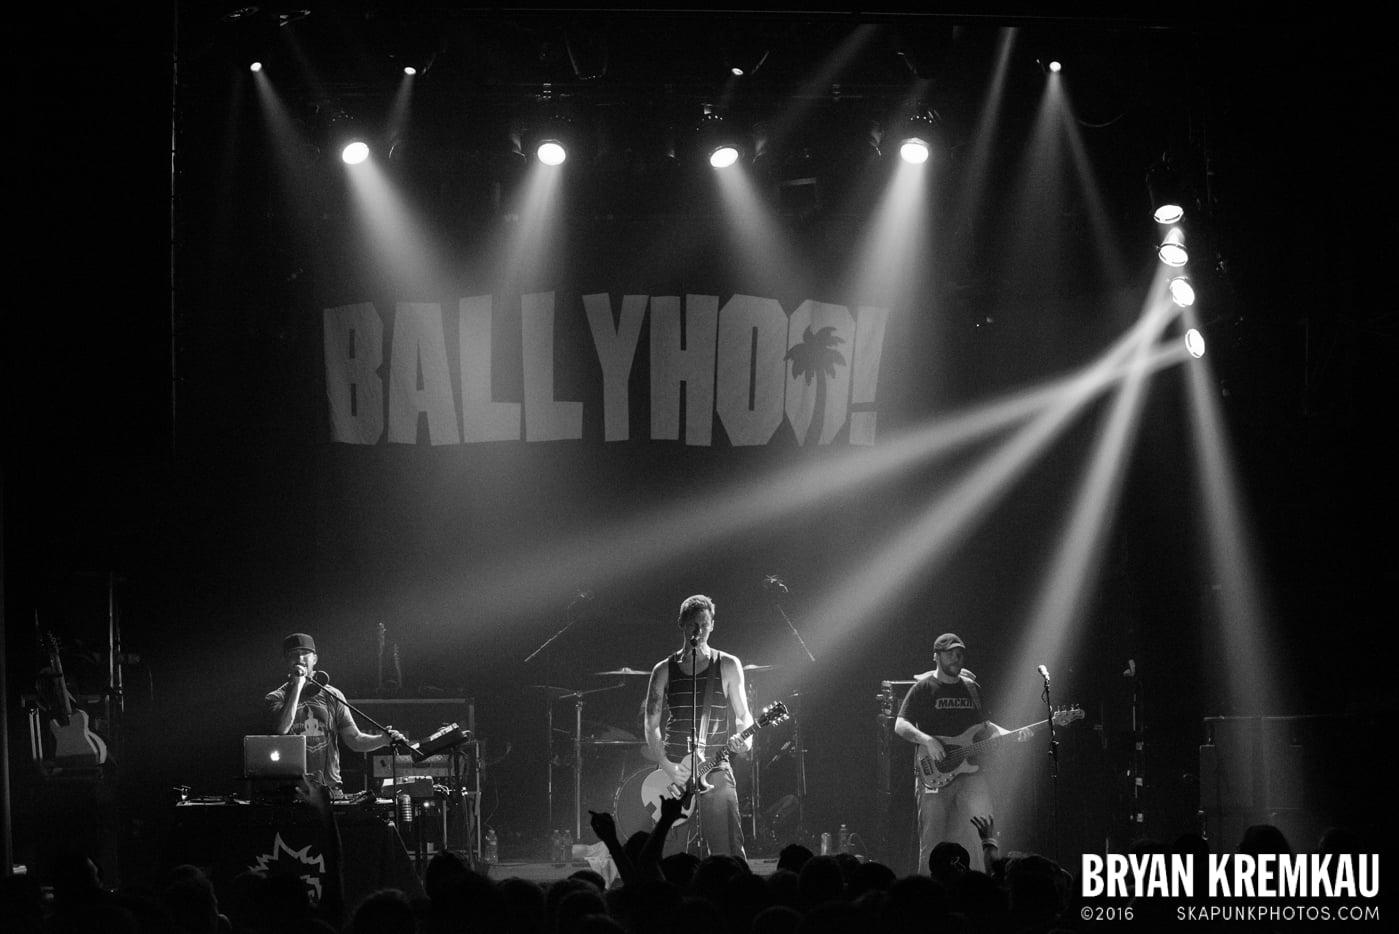 Ballyhoo! @ Gramercy Theatre, NYC - 6.27.13 (3)